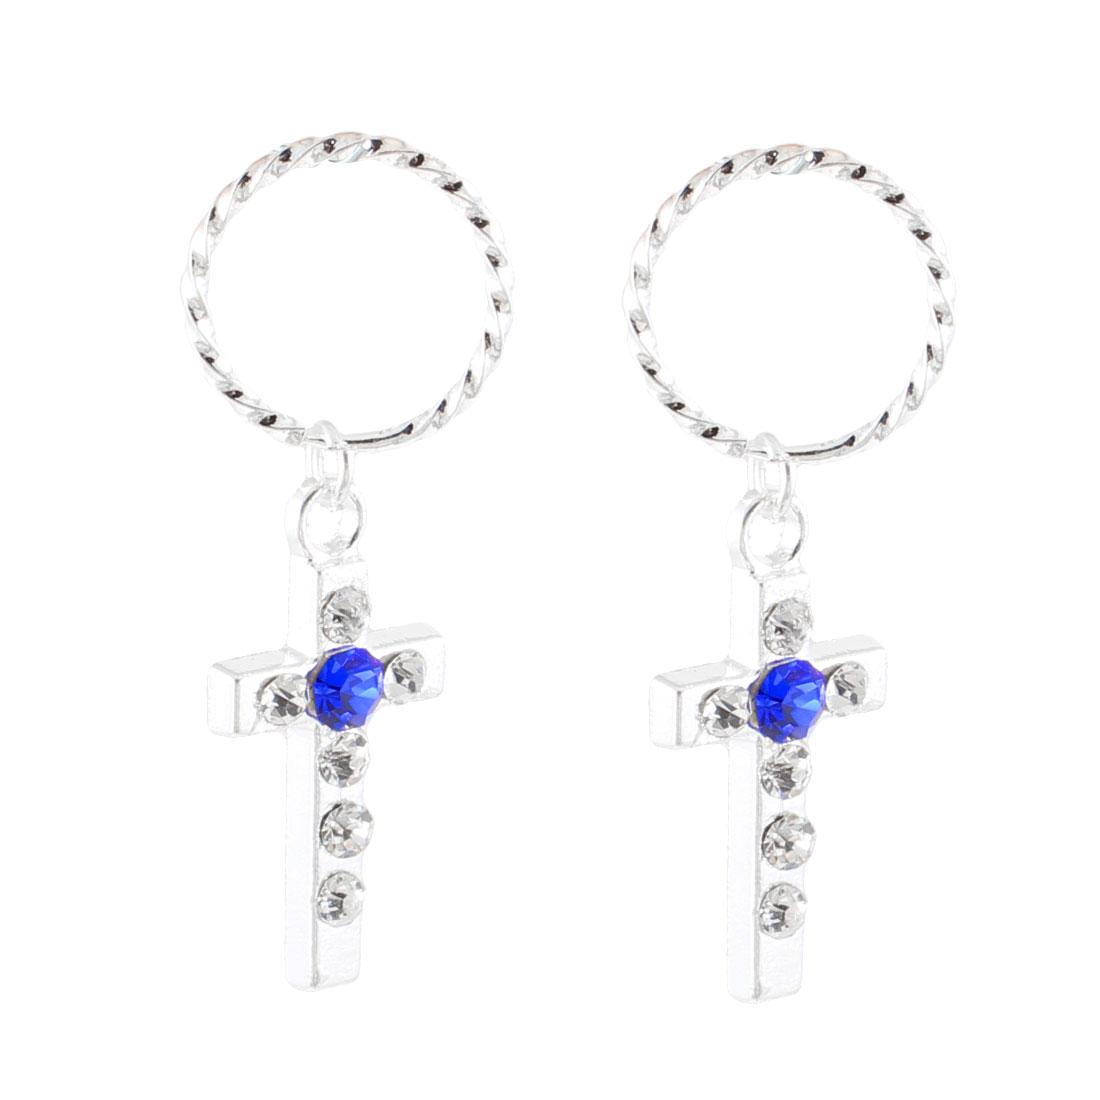 Lady Blue Glittery Rhinestone Inlaid Silver Tone Cross Dangle Earrings Pair